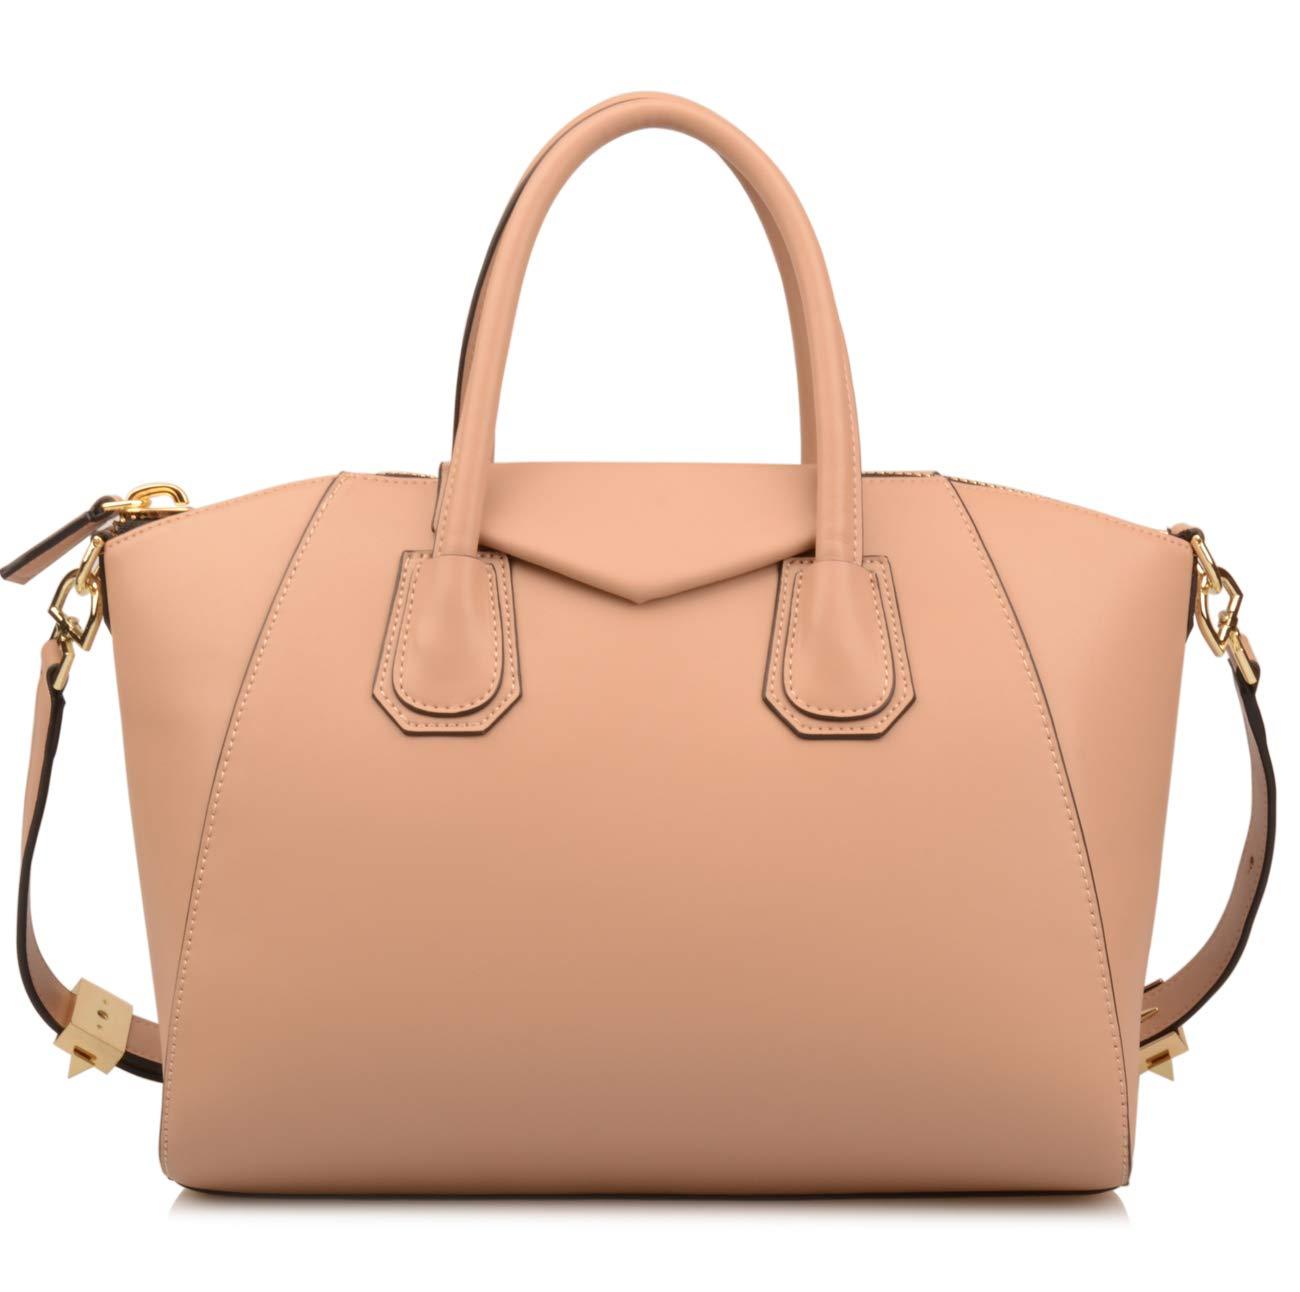 Ainifeel Women's Genuine Leather Everyday Purse Top Handle Handbags Shoulder Bags (Medium, Apricot)